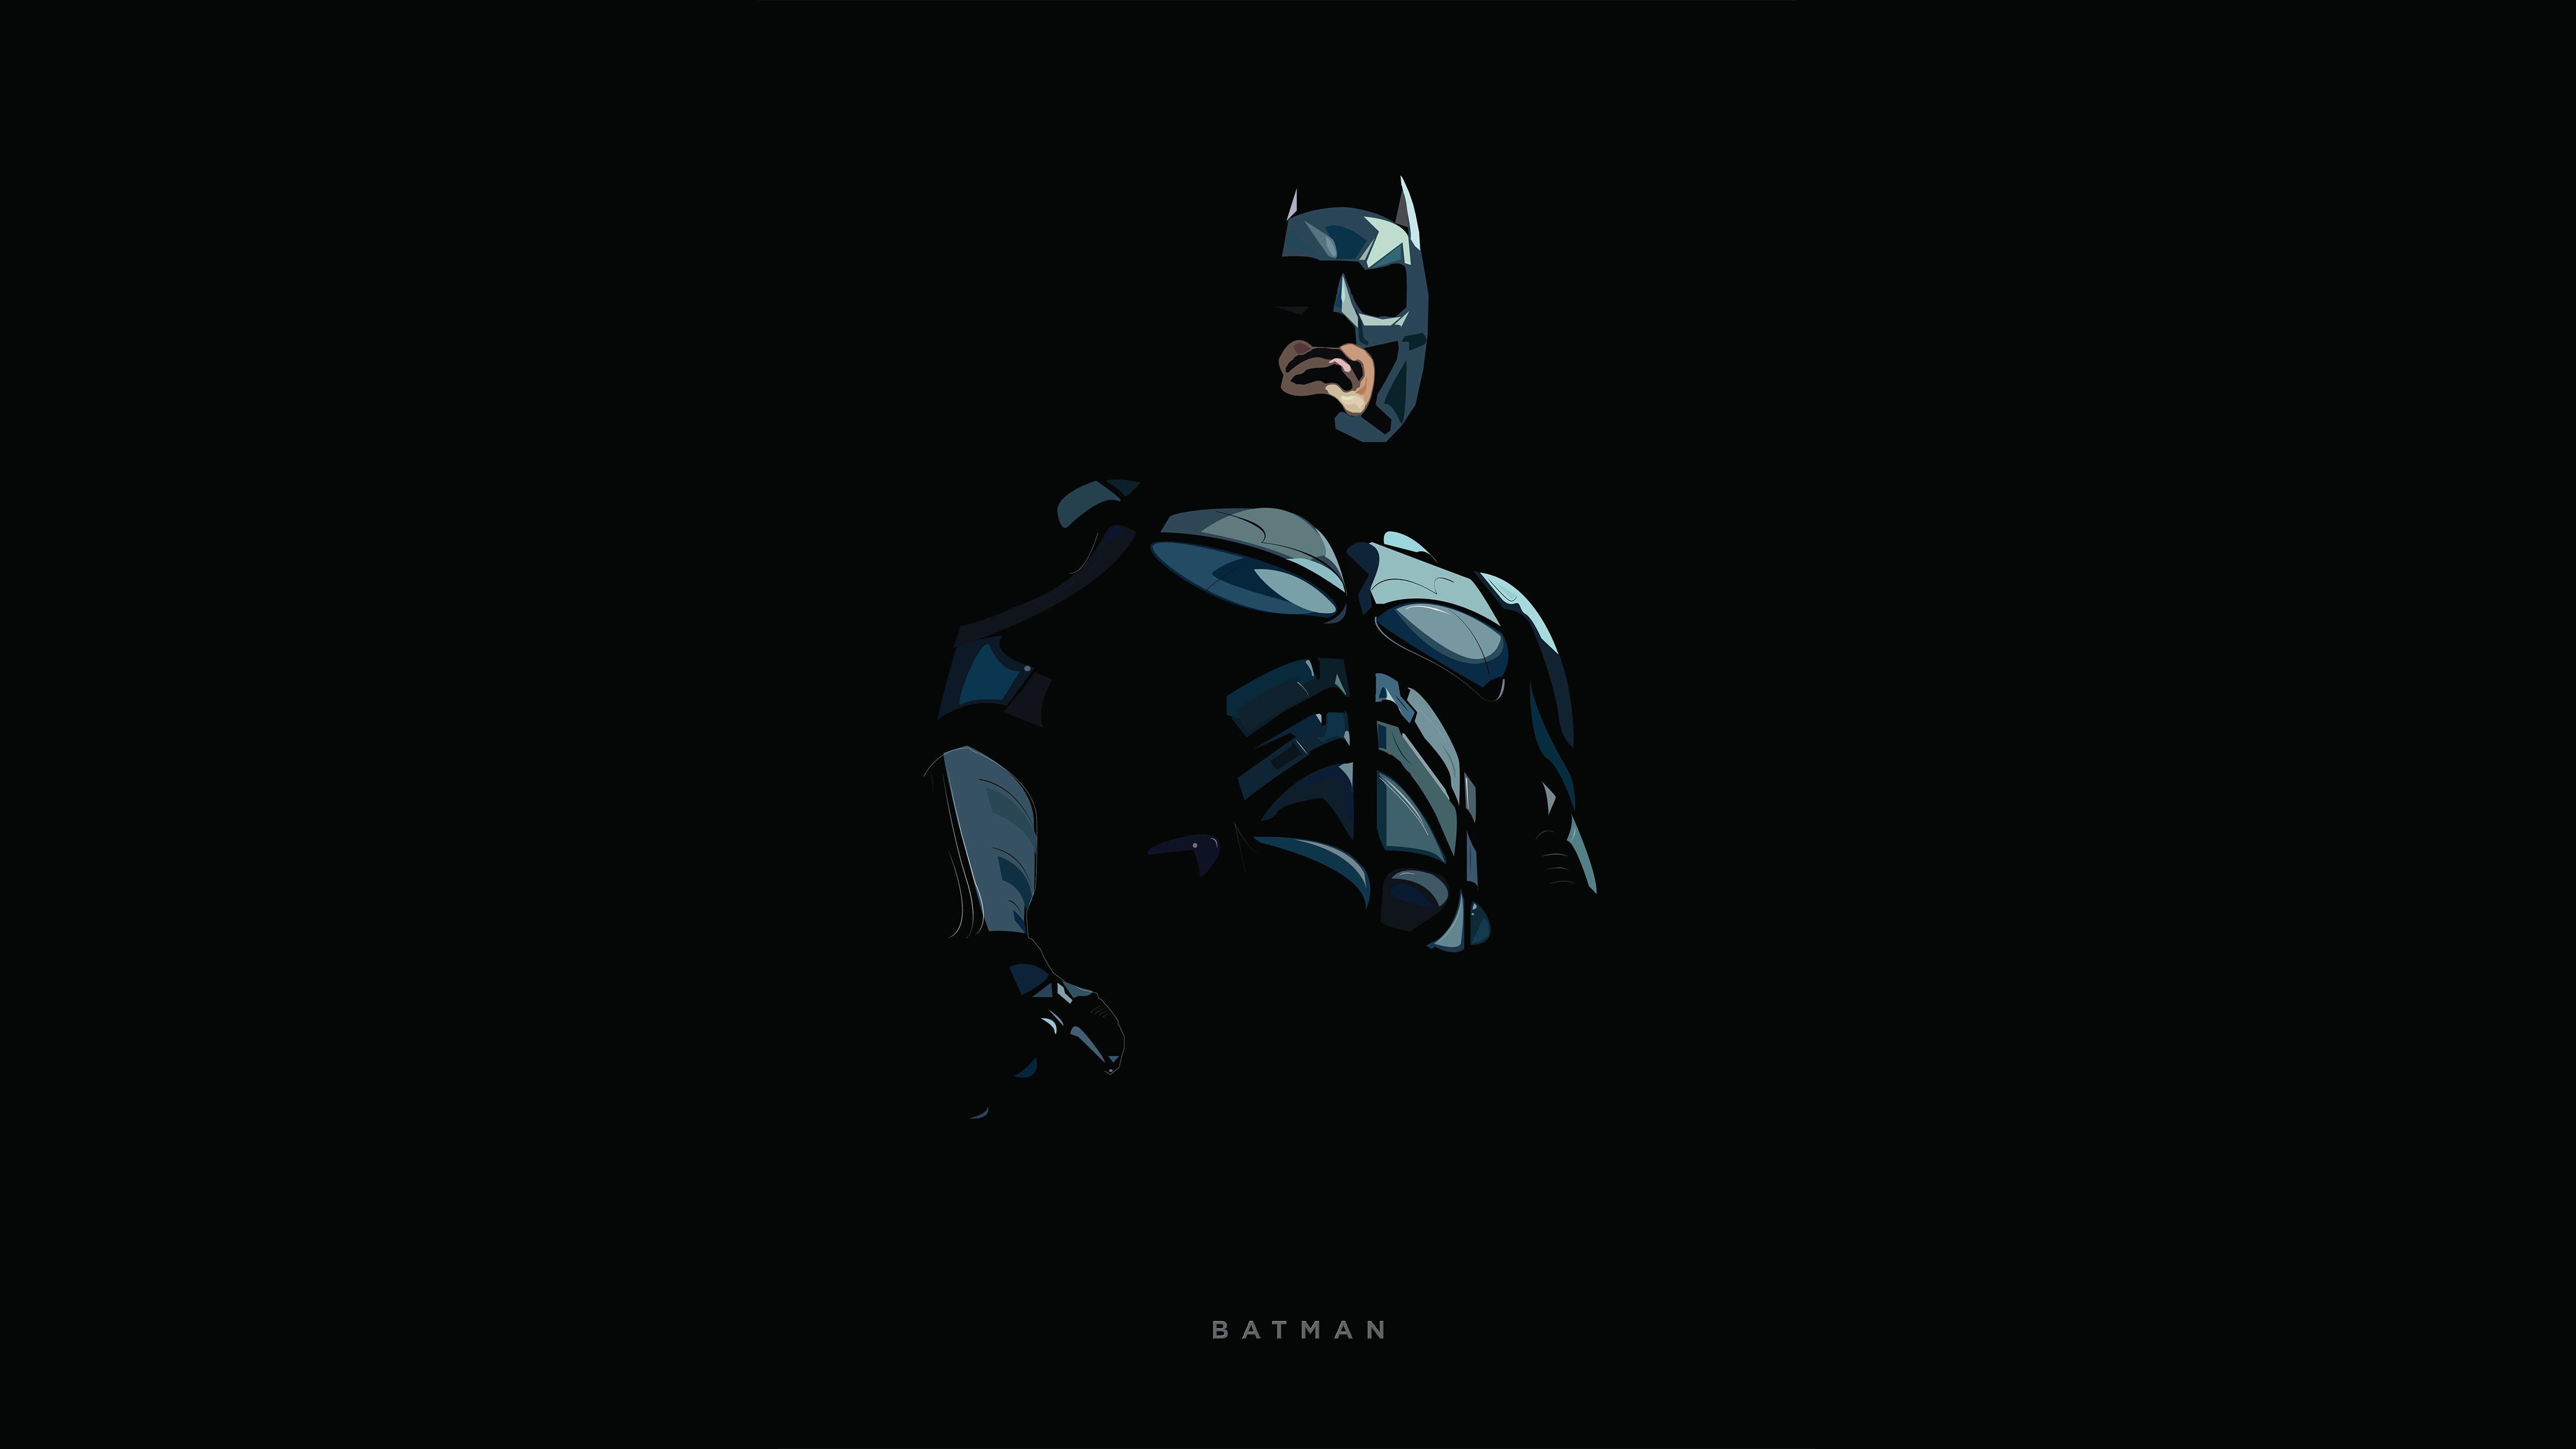 Download 5120x2880 Wallpaper Batman Minimal Artwork 5k